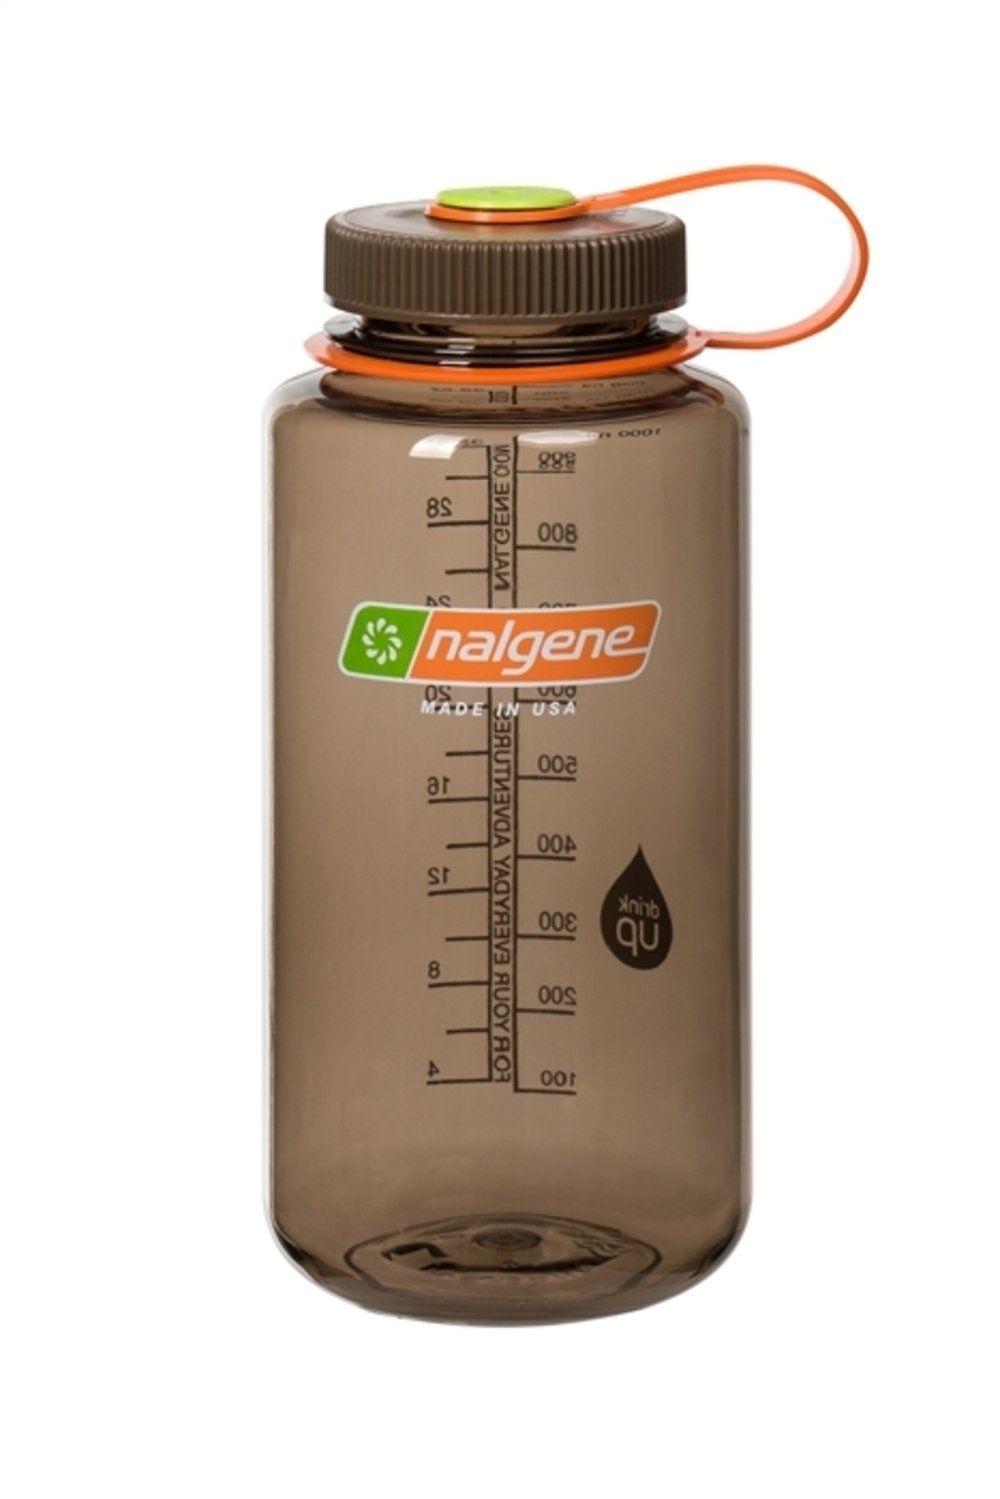 125fc8ed94 Nalgene Tritan 32oz Wide Mouth BPA-Free Water Bottle | Wishlist ...